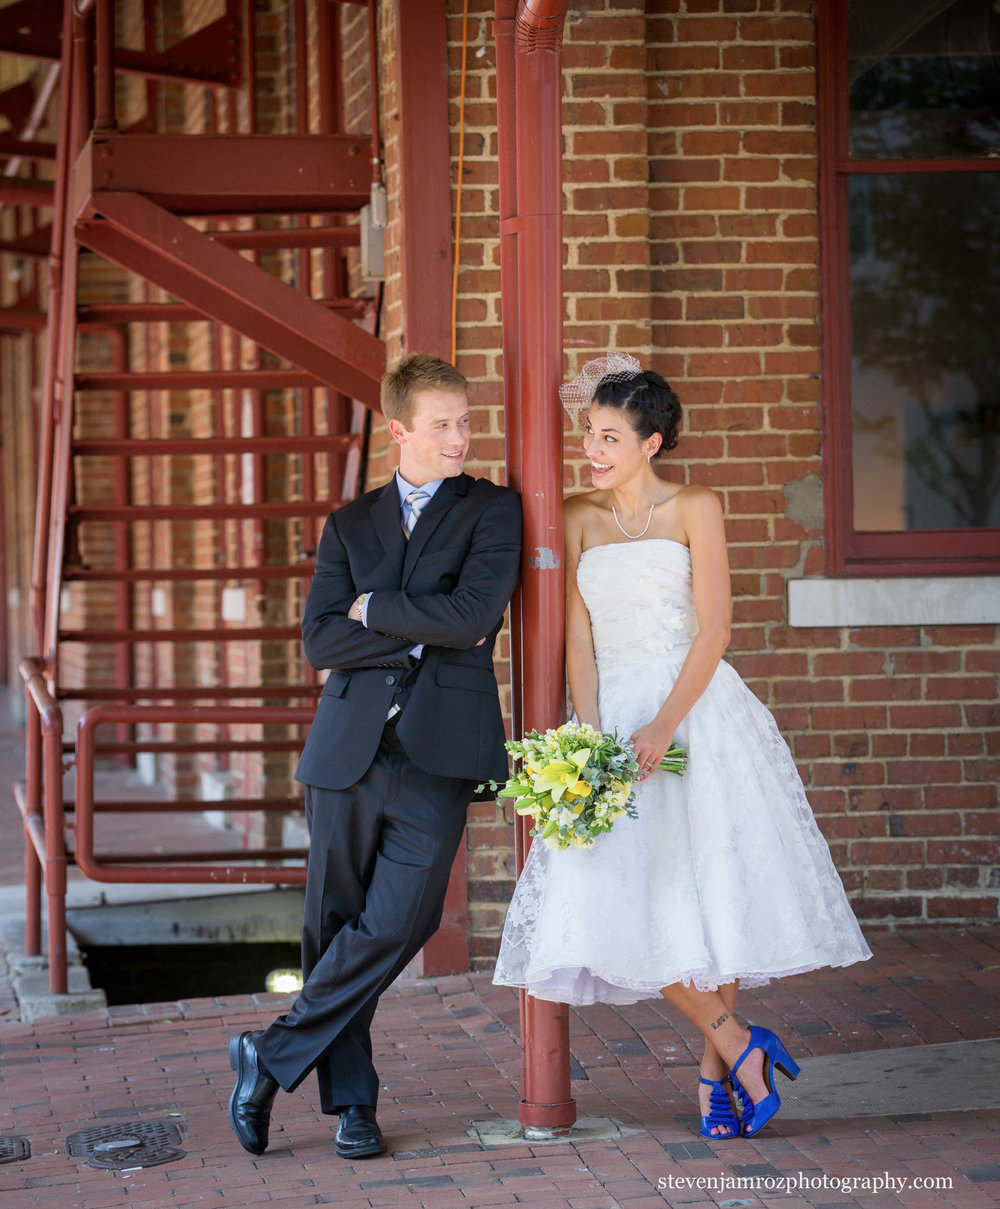 city-market-wedding-raleigh-nc-steven-jamroz-photography-0415.jpg